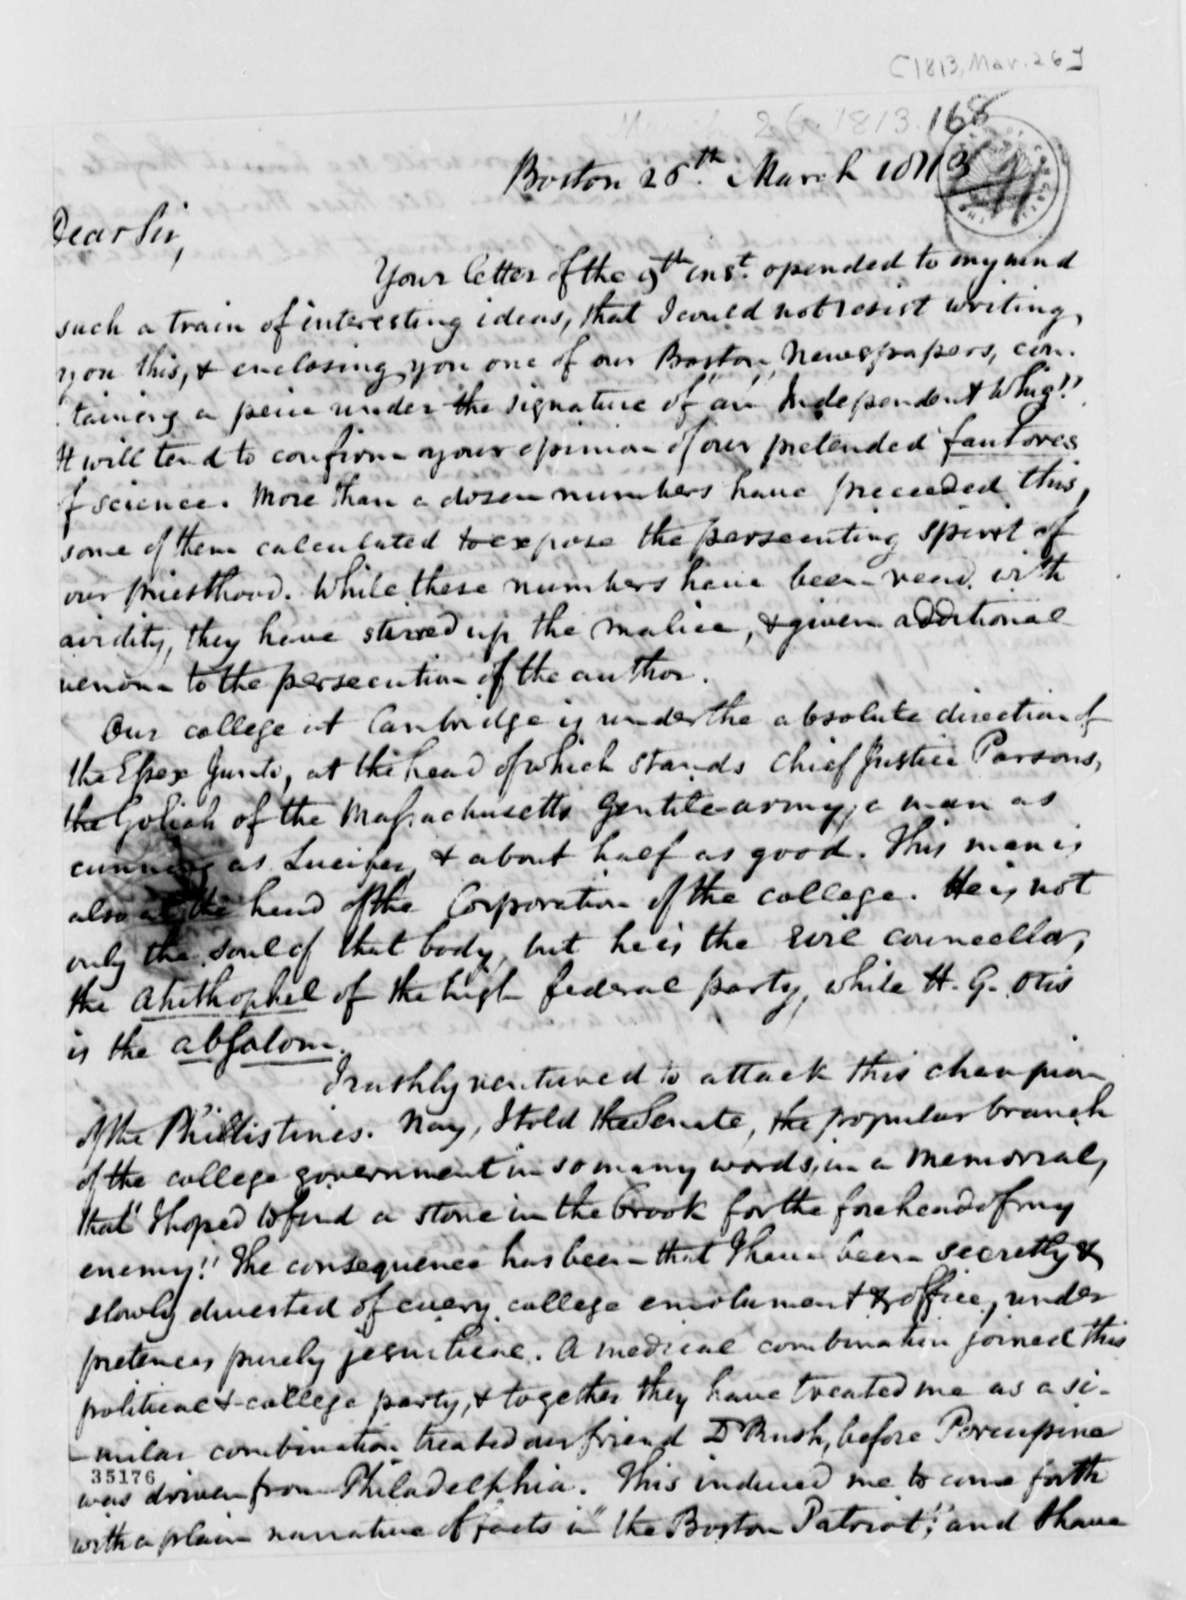 Benjamin Waterhouse to Thomas Jefferson, March 26, 1813